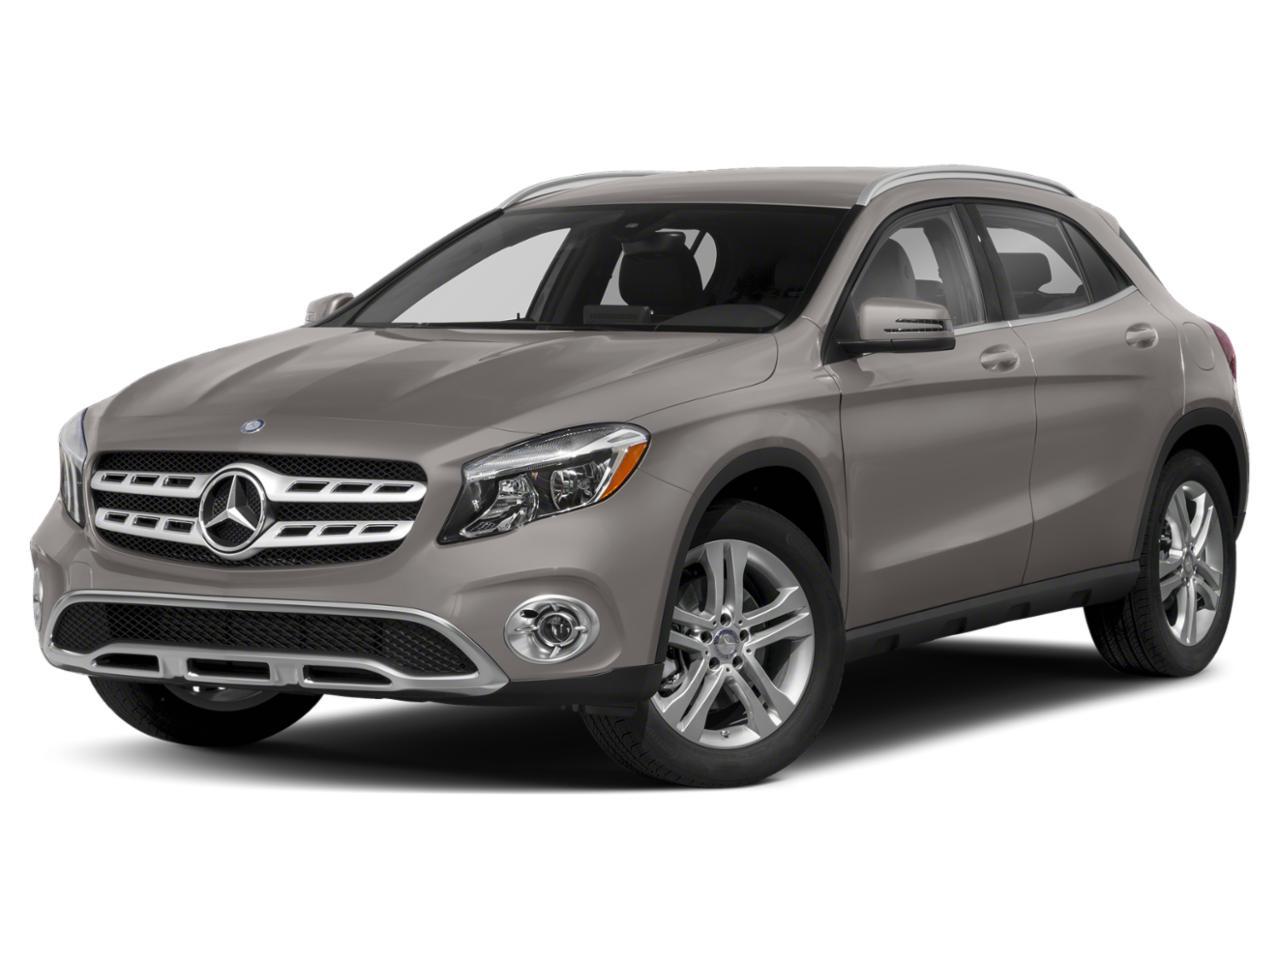 2018 Mercedes-Benz GLA Vehicle Photo in Corpus Christi, TX 78411